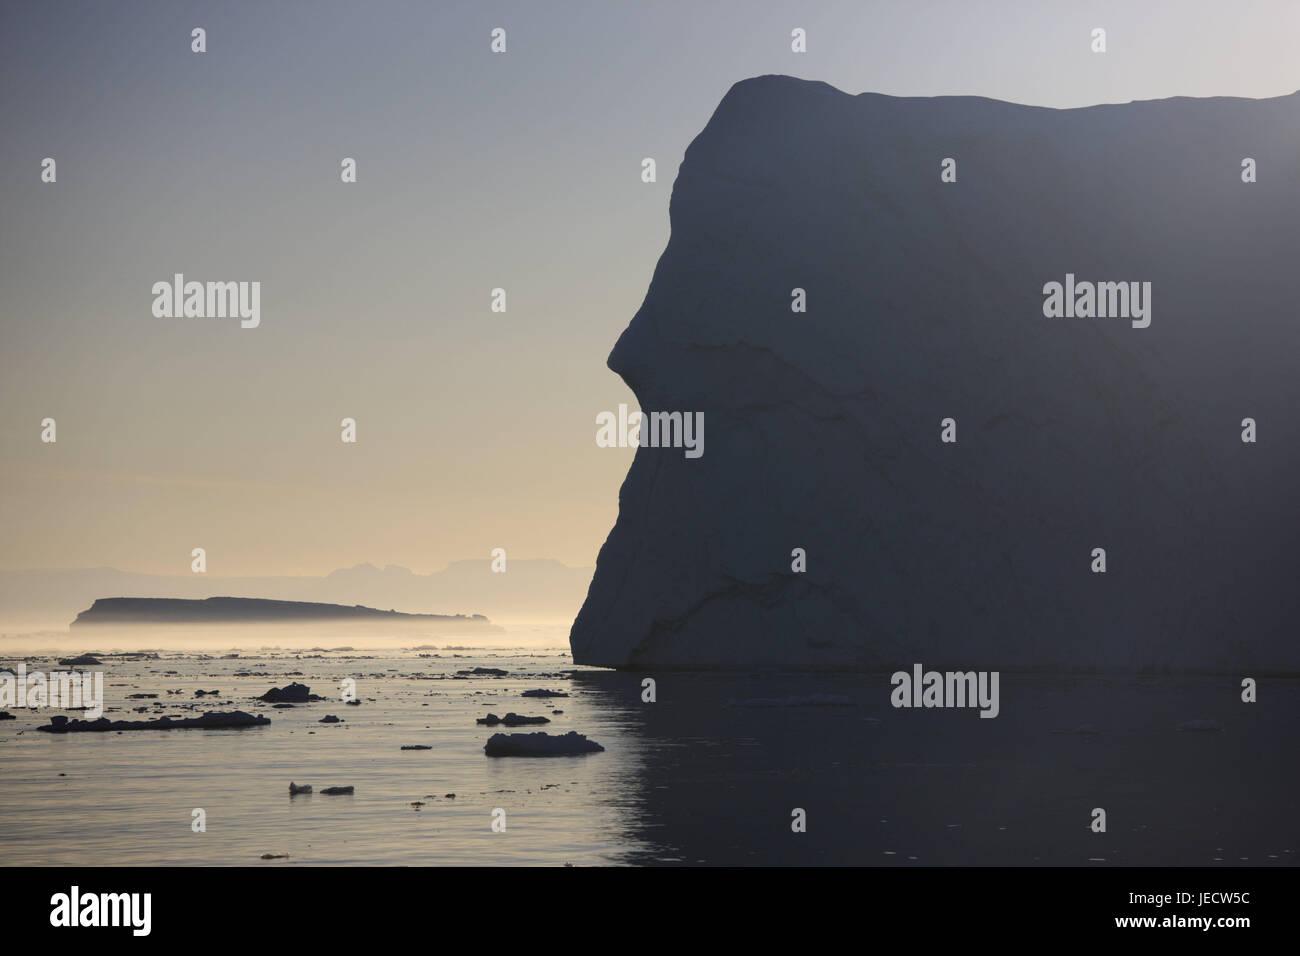 Greenland, Disco Bay, Ilulissat, fjord, icebergs, scarp, detail, Western Greenland, ice, glacier, the Arctic, summer, - Stock Image